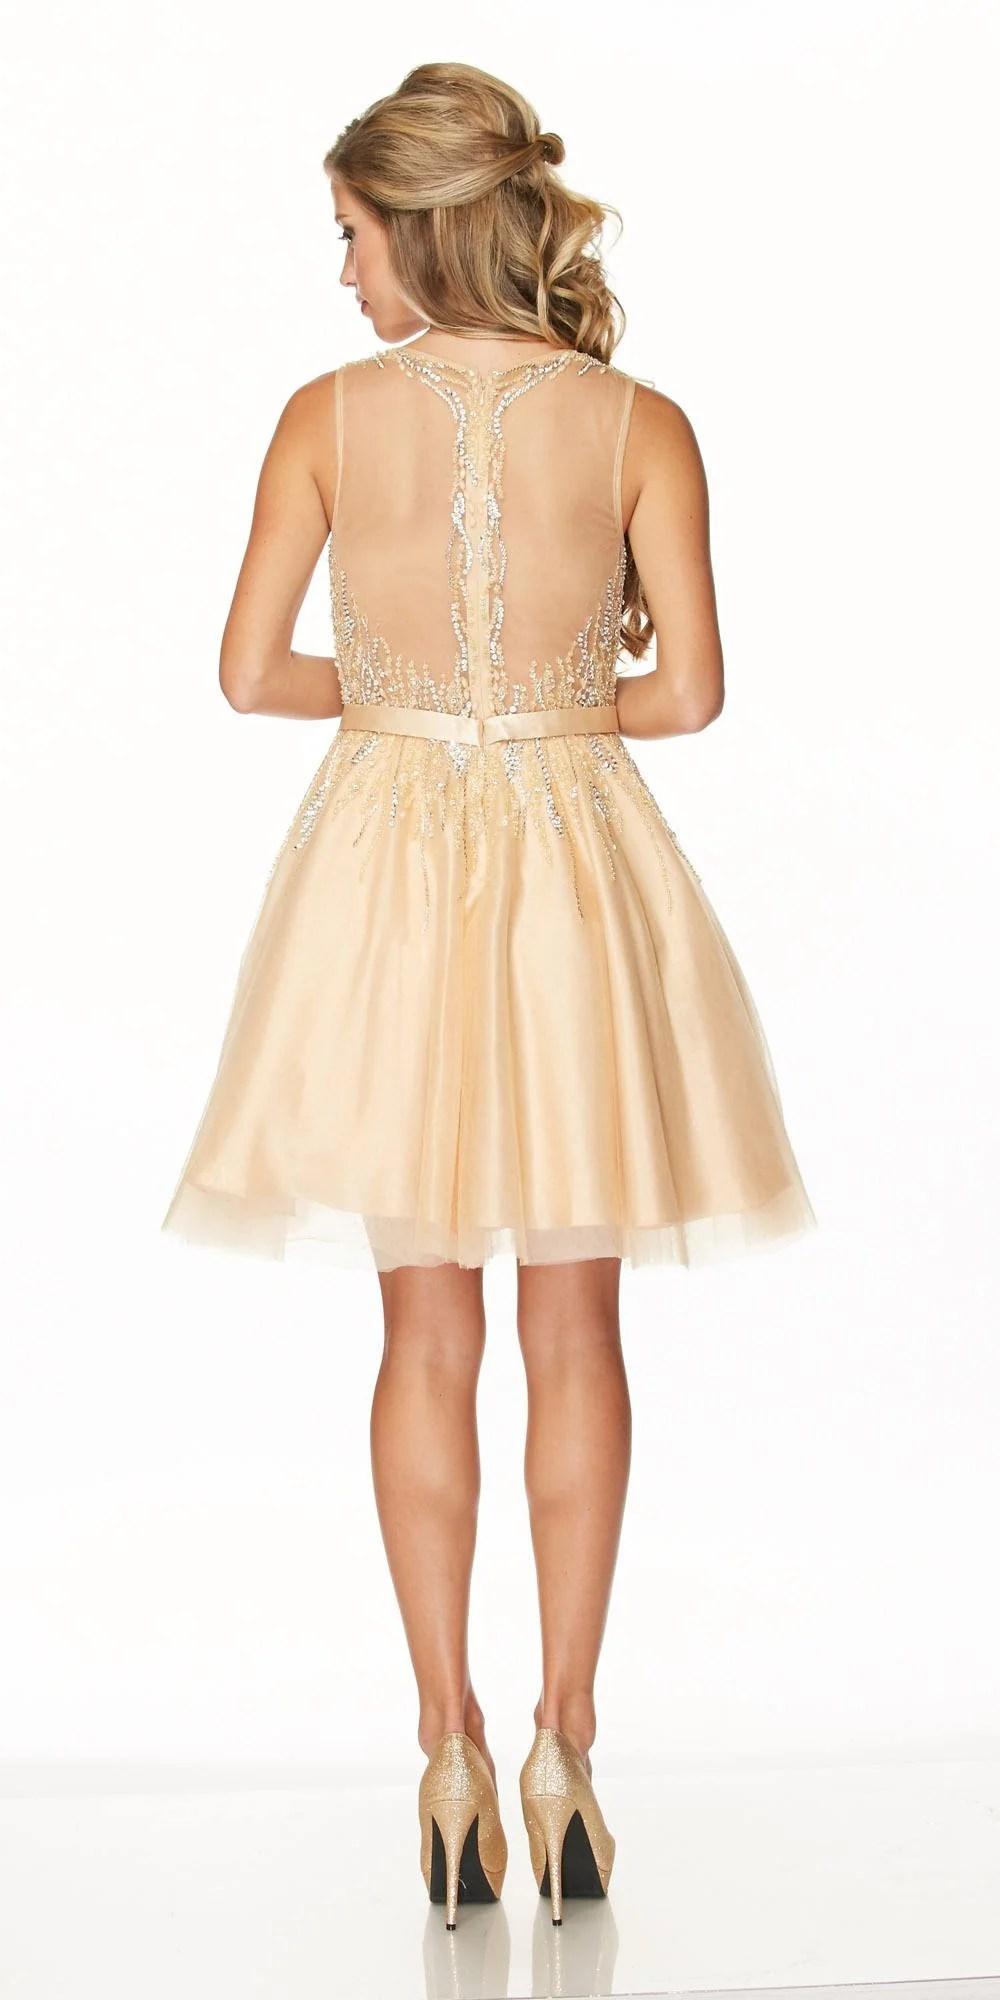 Juliet Dress in Blush Sequins